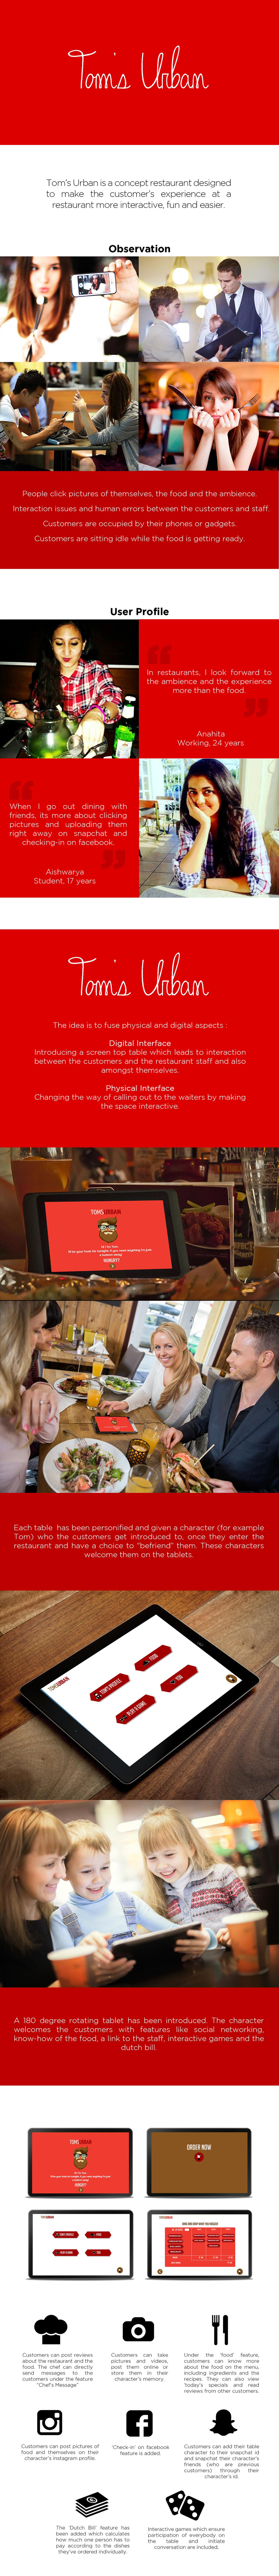 interaction restaurant Experience interactive Service design Interface